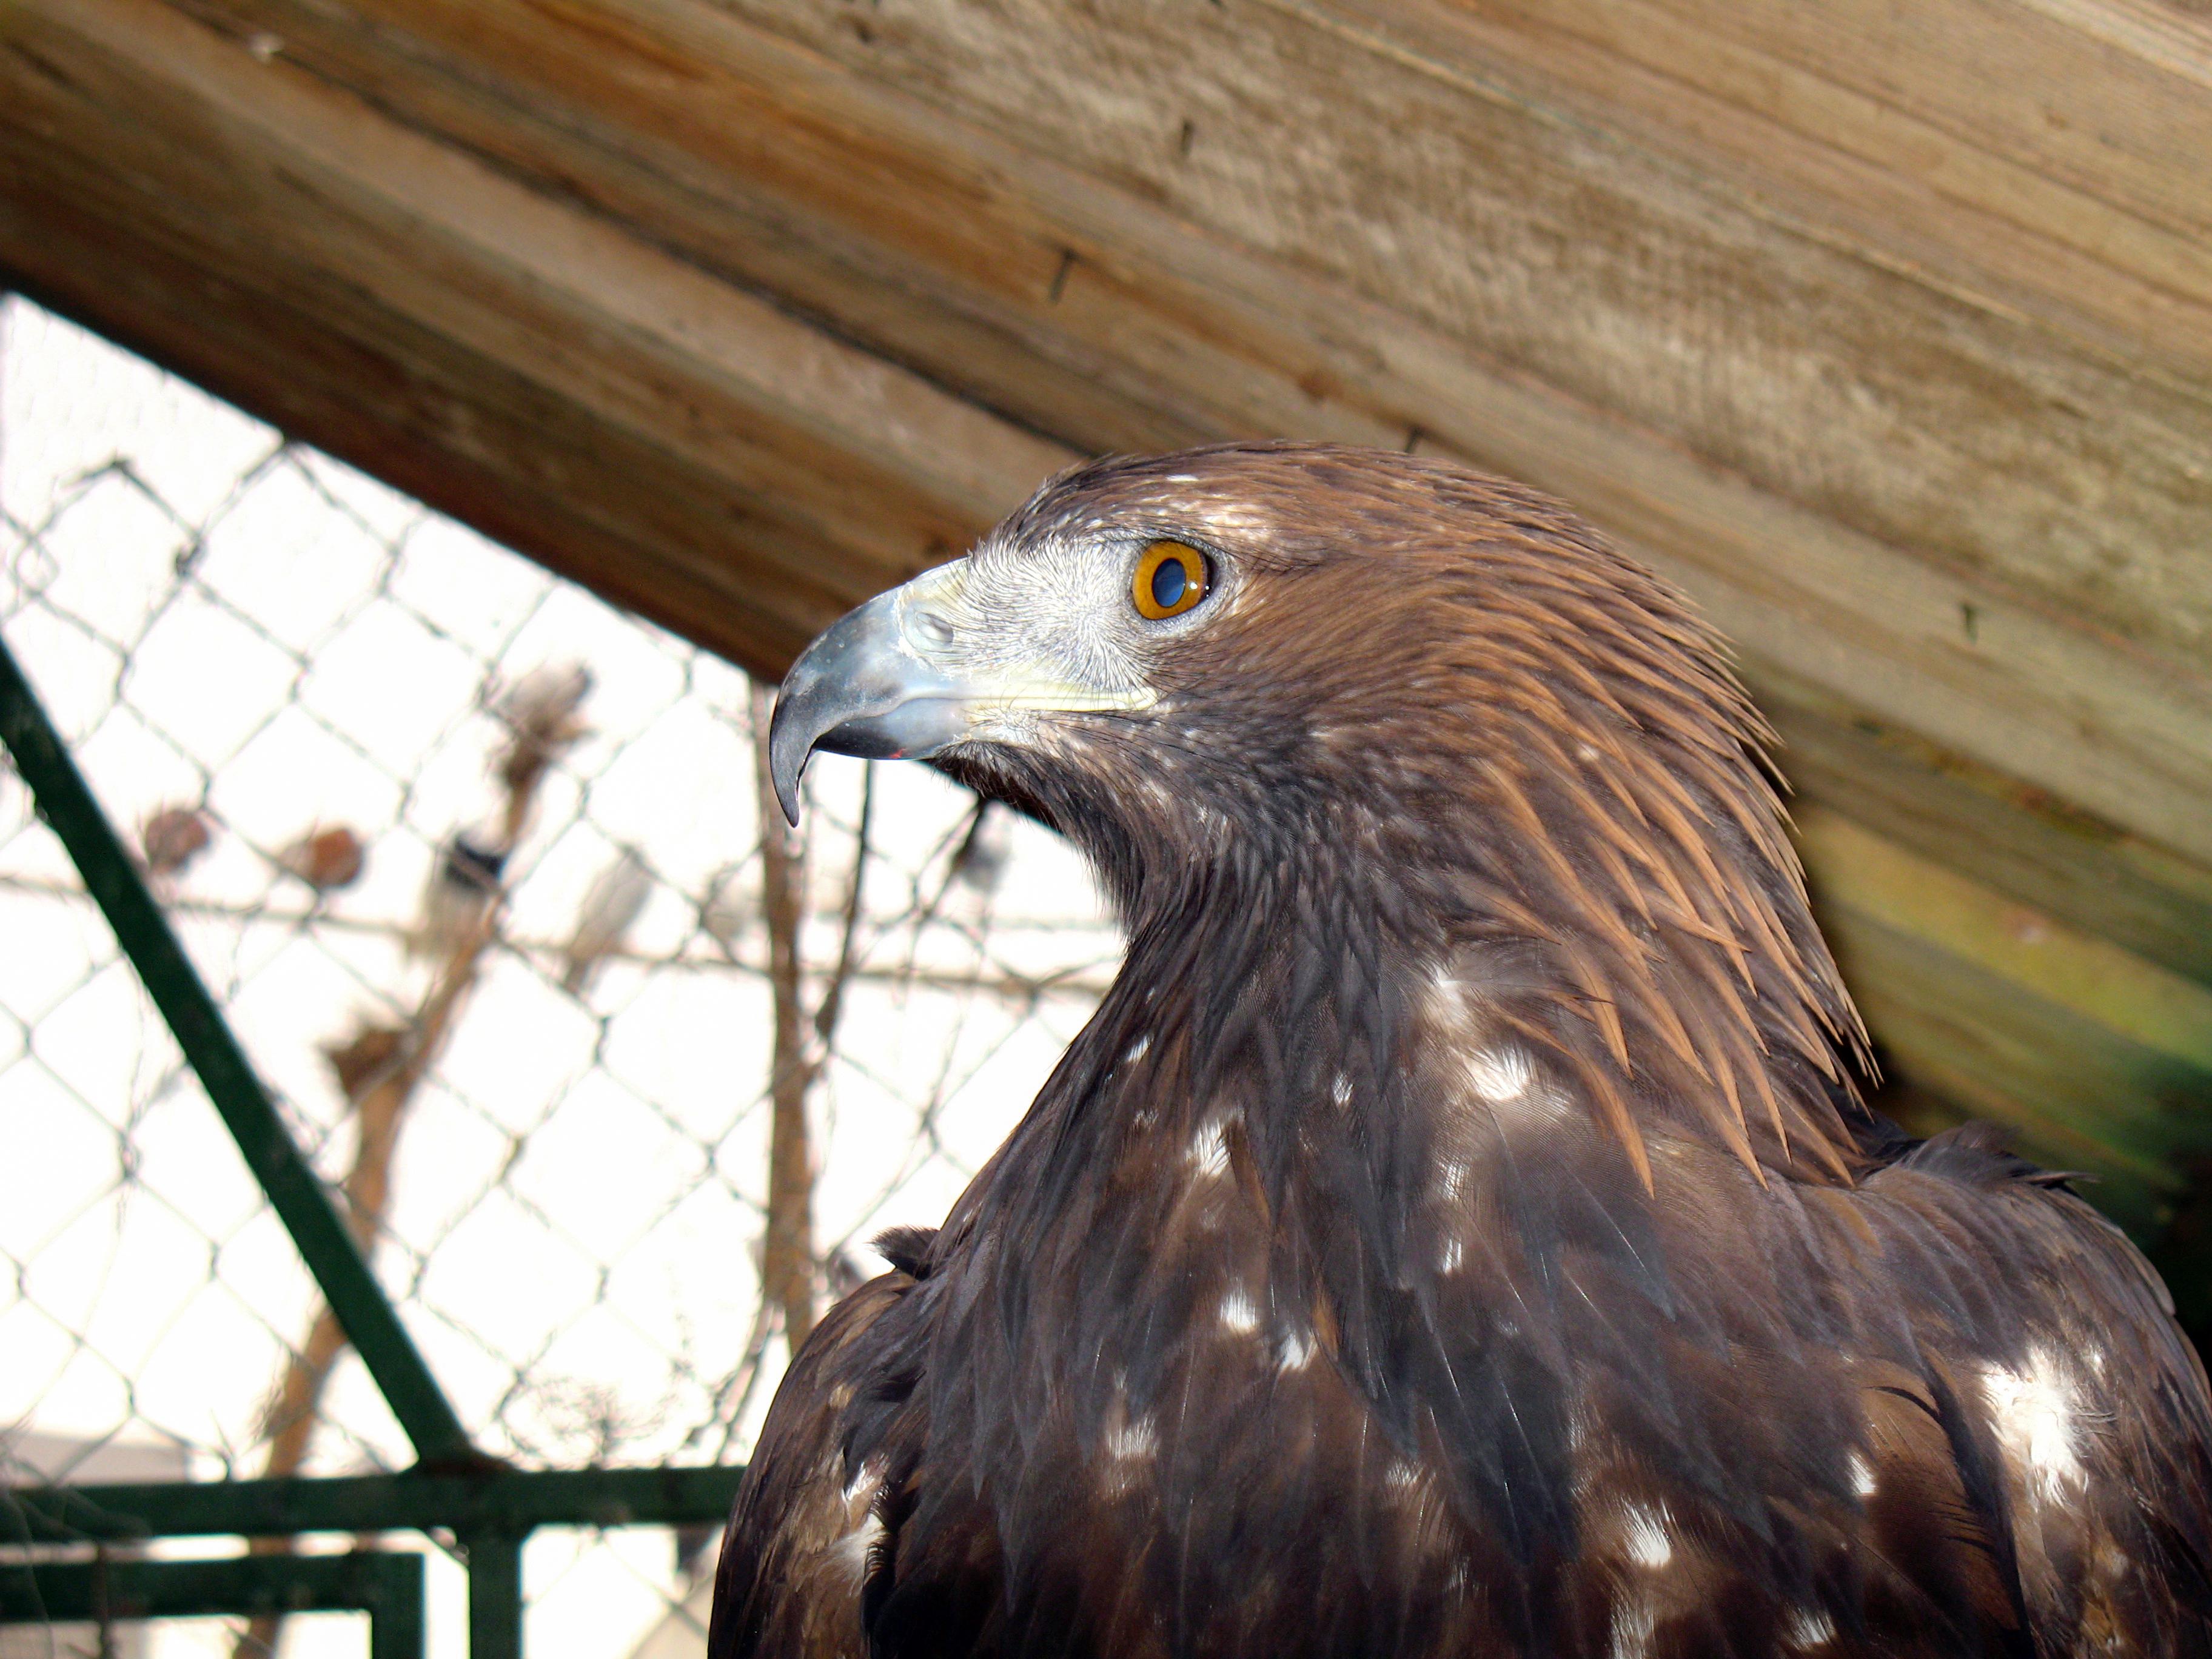 File:Eagle عقاب 12.jpg - Wikimedia Commons